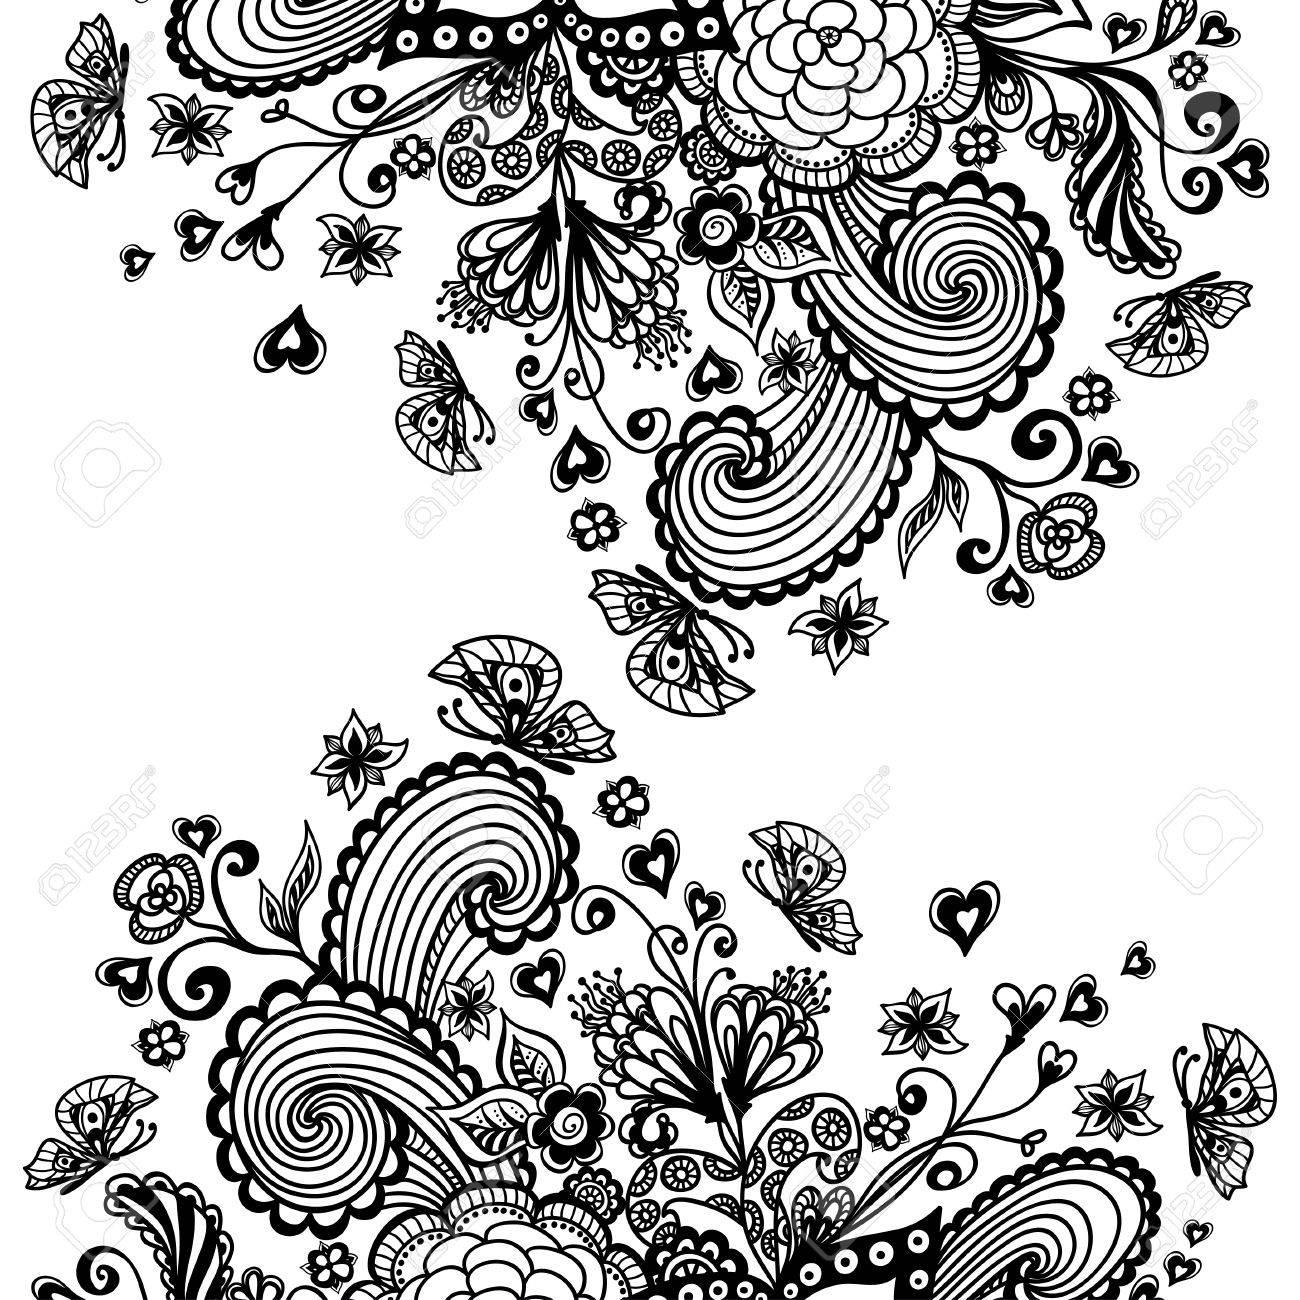 Zen-doodle Background Or Pattern With Flowers Butterflies Hearts ...